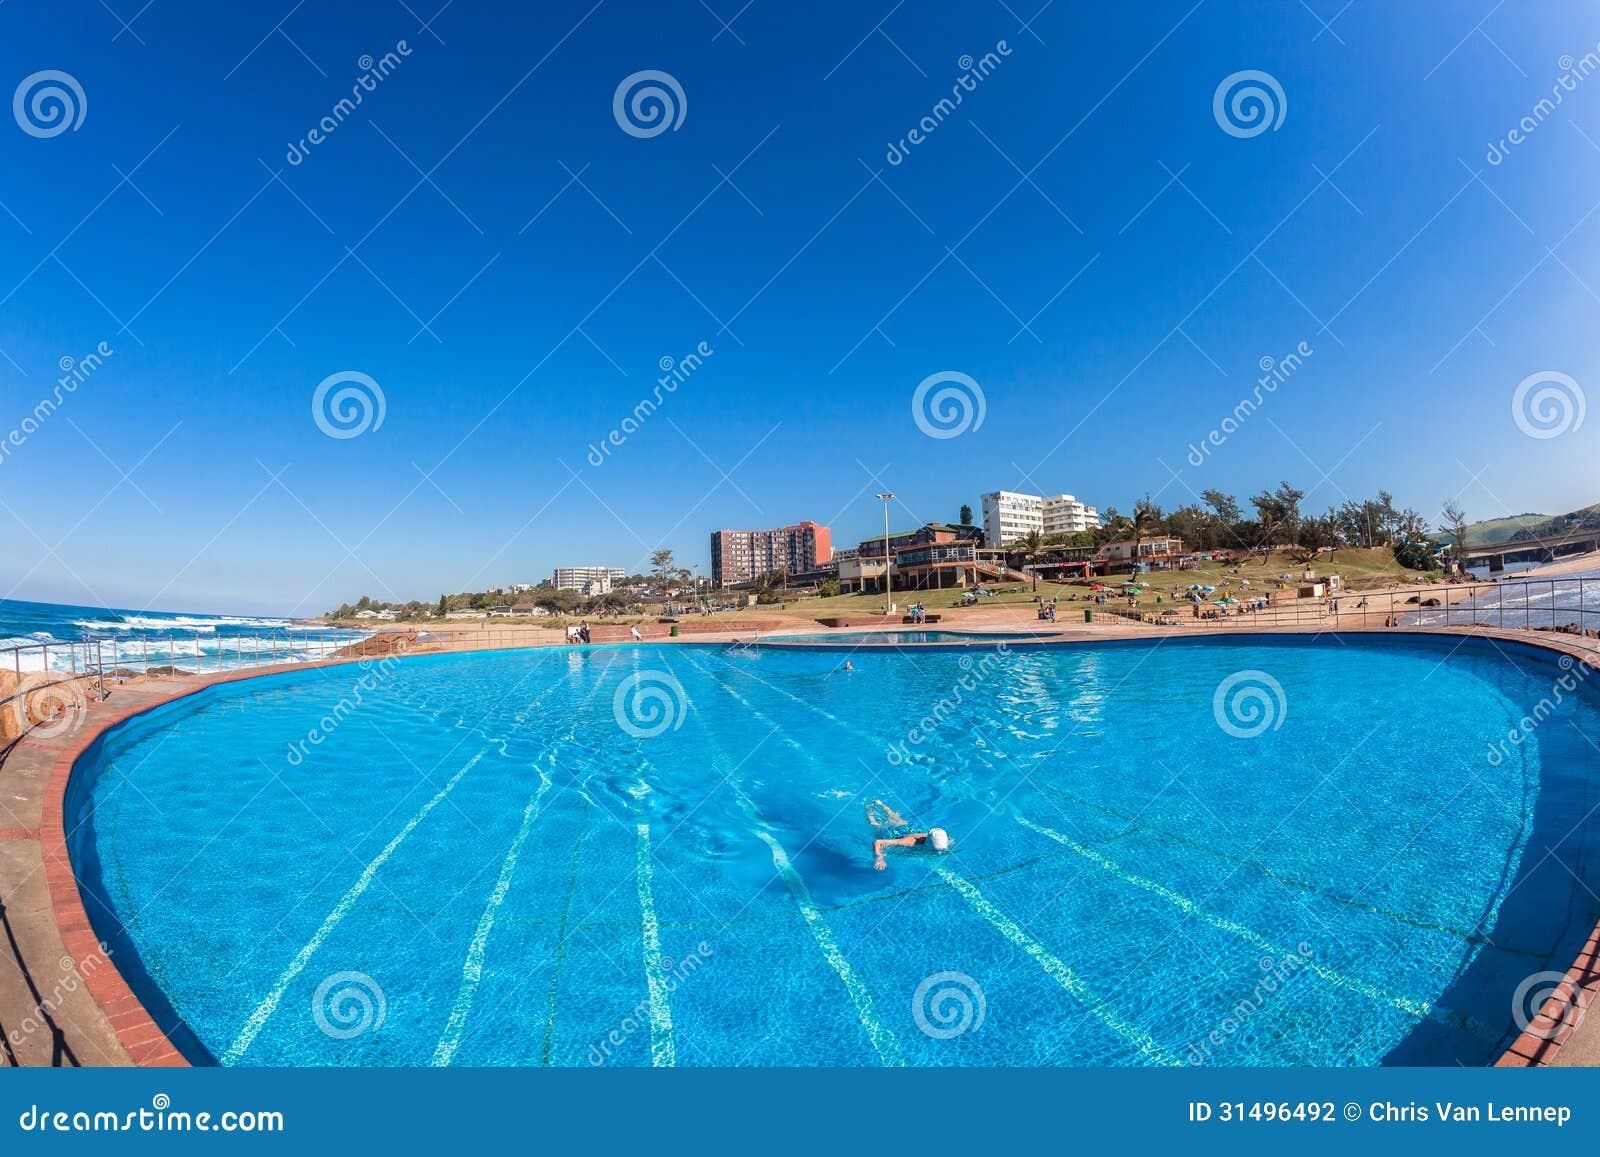 Pools Swim Blue Ocean Beach Editorial Photography Image